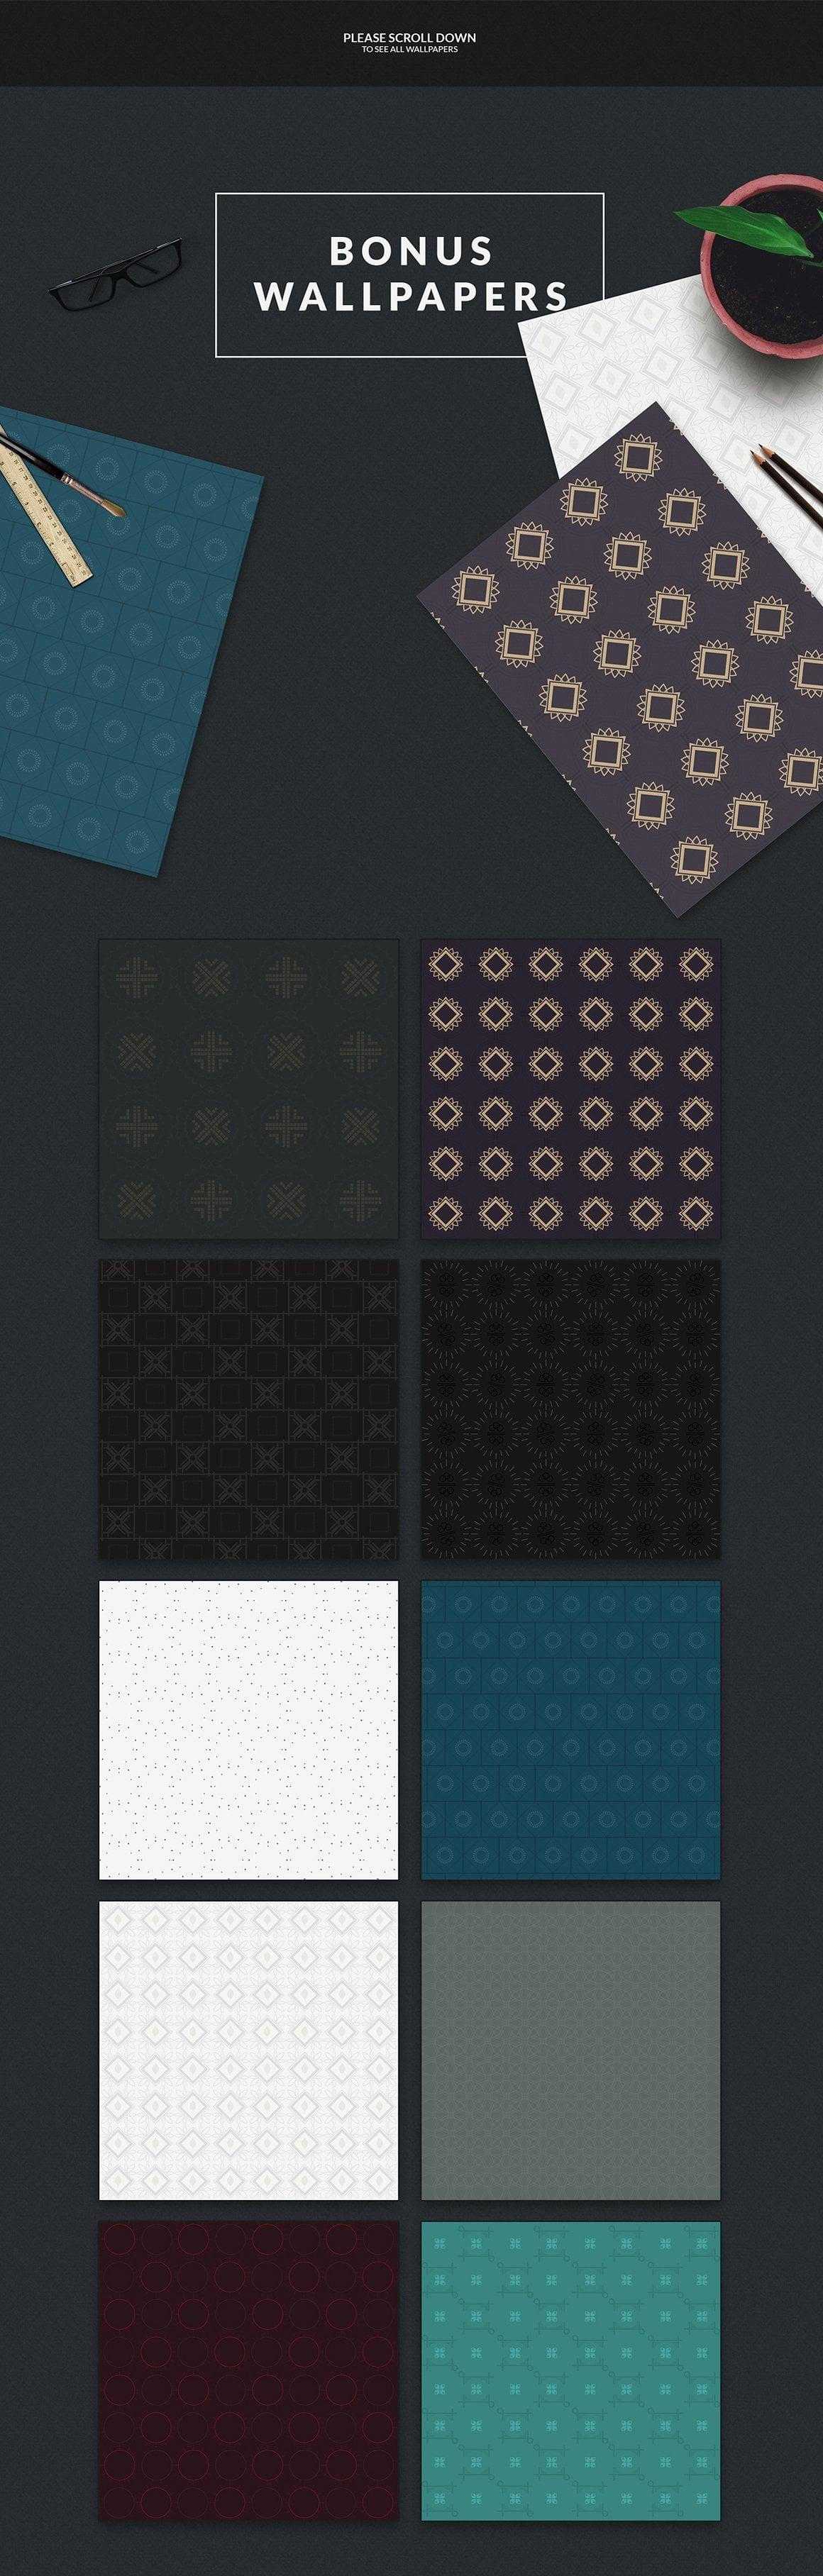 Logo Creation Kit: 409 Elements - just $5 - 7